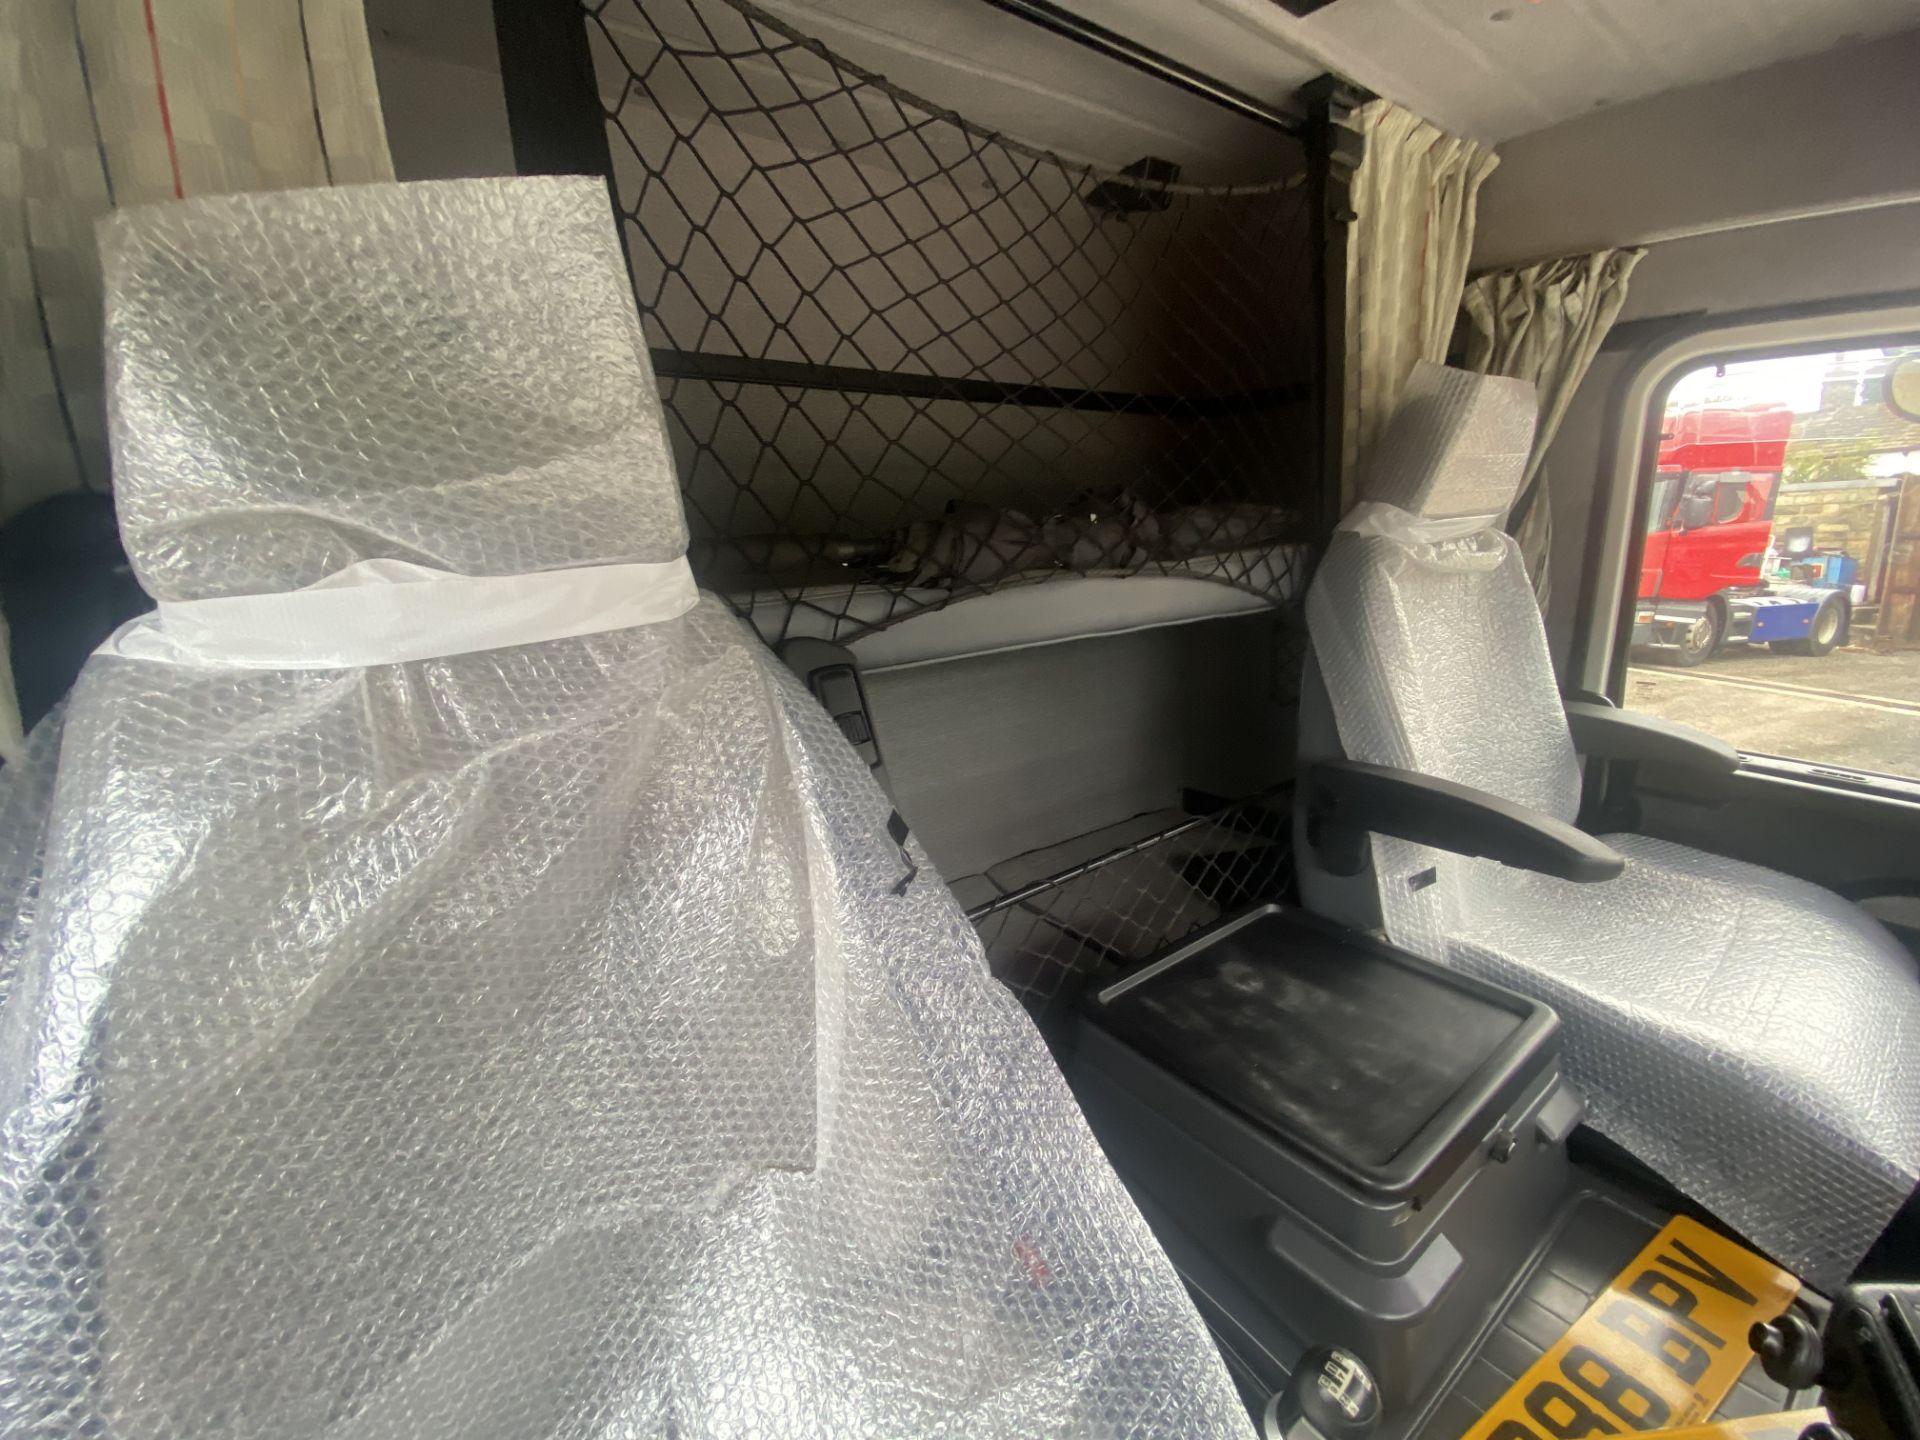 Scania 143M450 V8 4X2 TRACTOR UNIT, registration no. L288 BPV, date first registered 01/08/1993, - Image 16 of 20